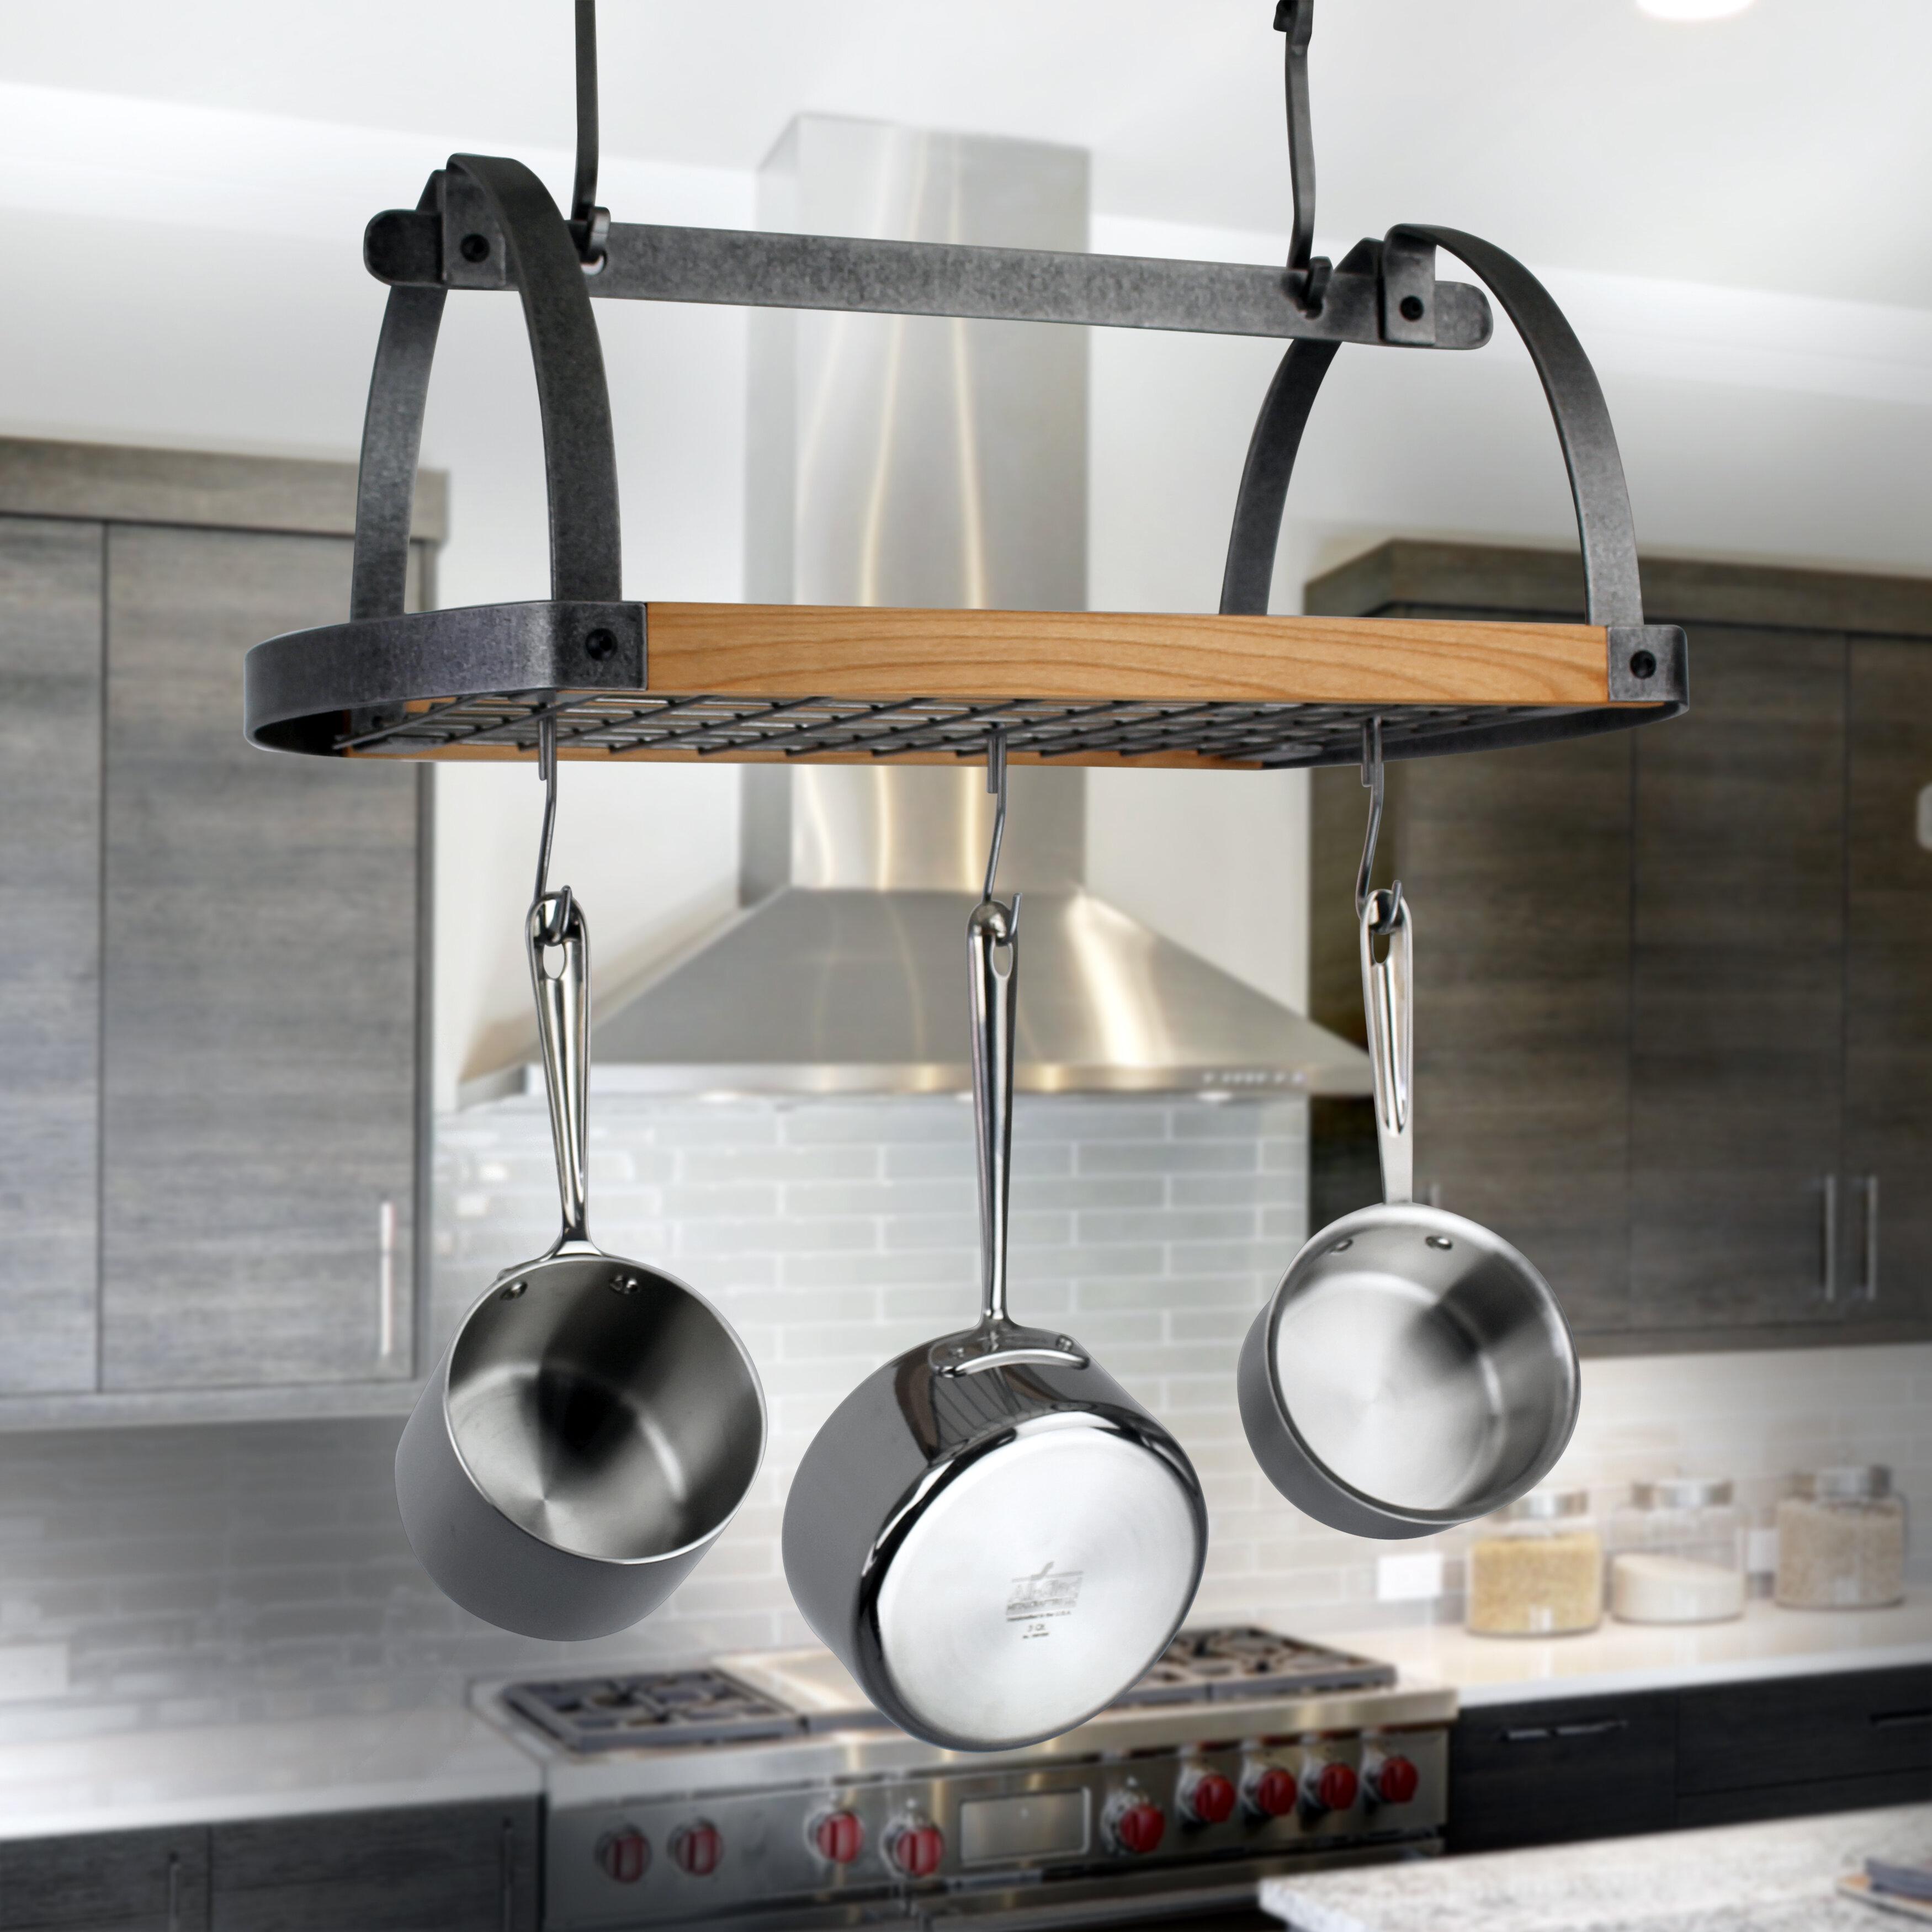 Decor Oval Ceiling Hanging Pot Rack